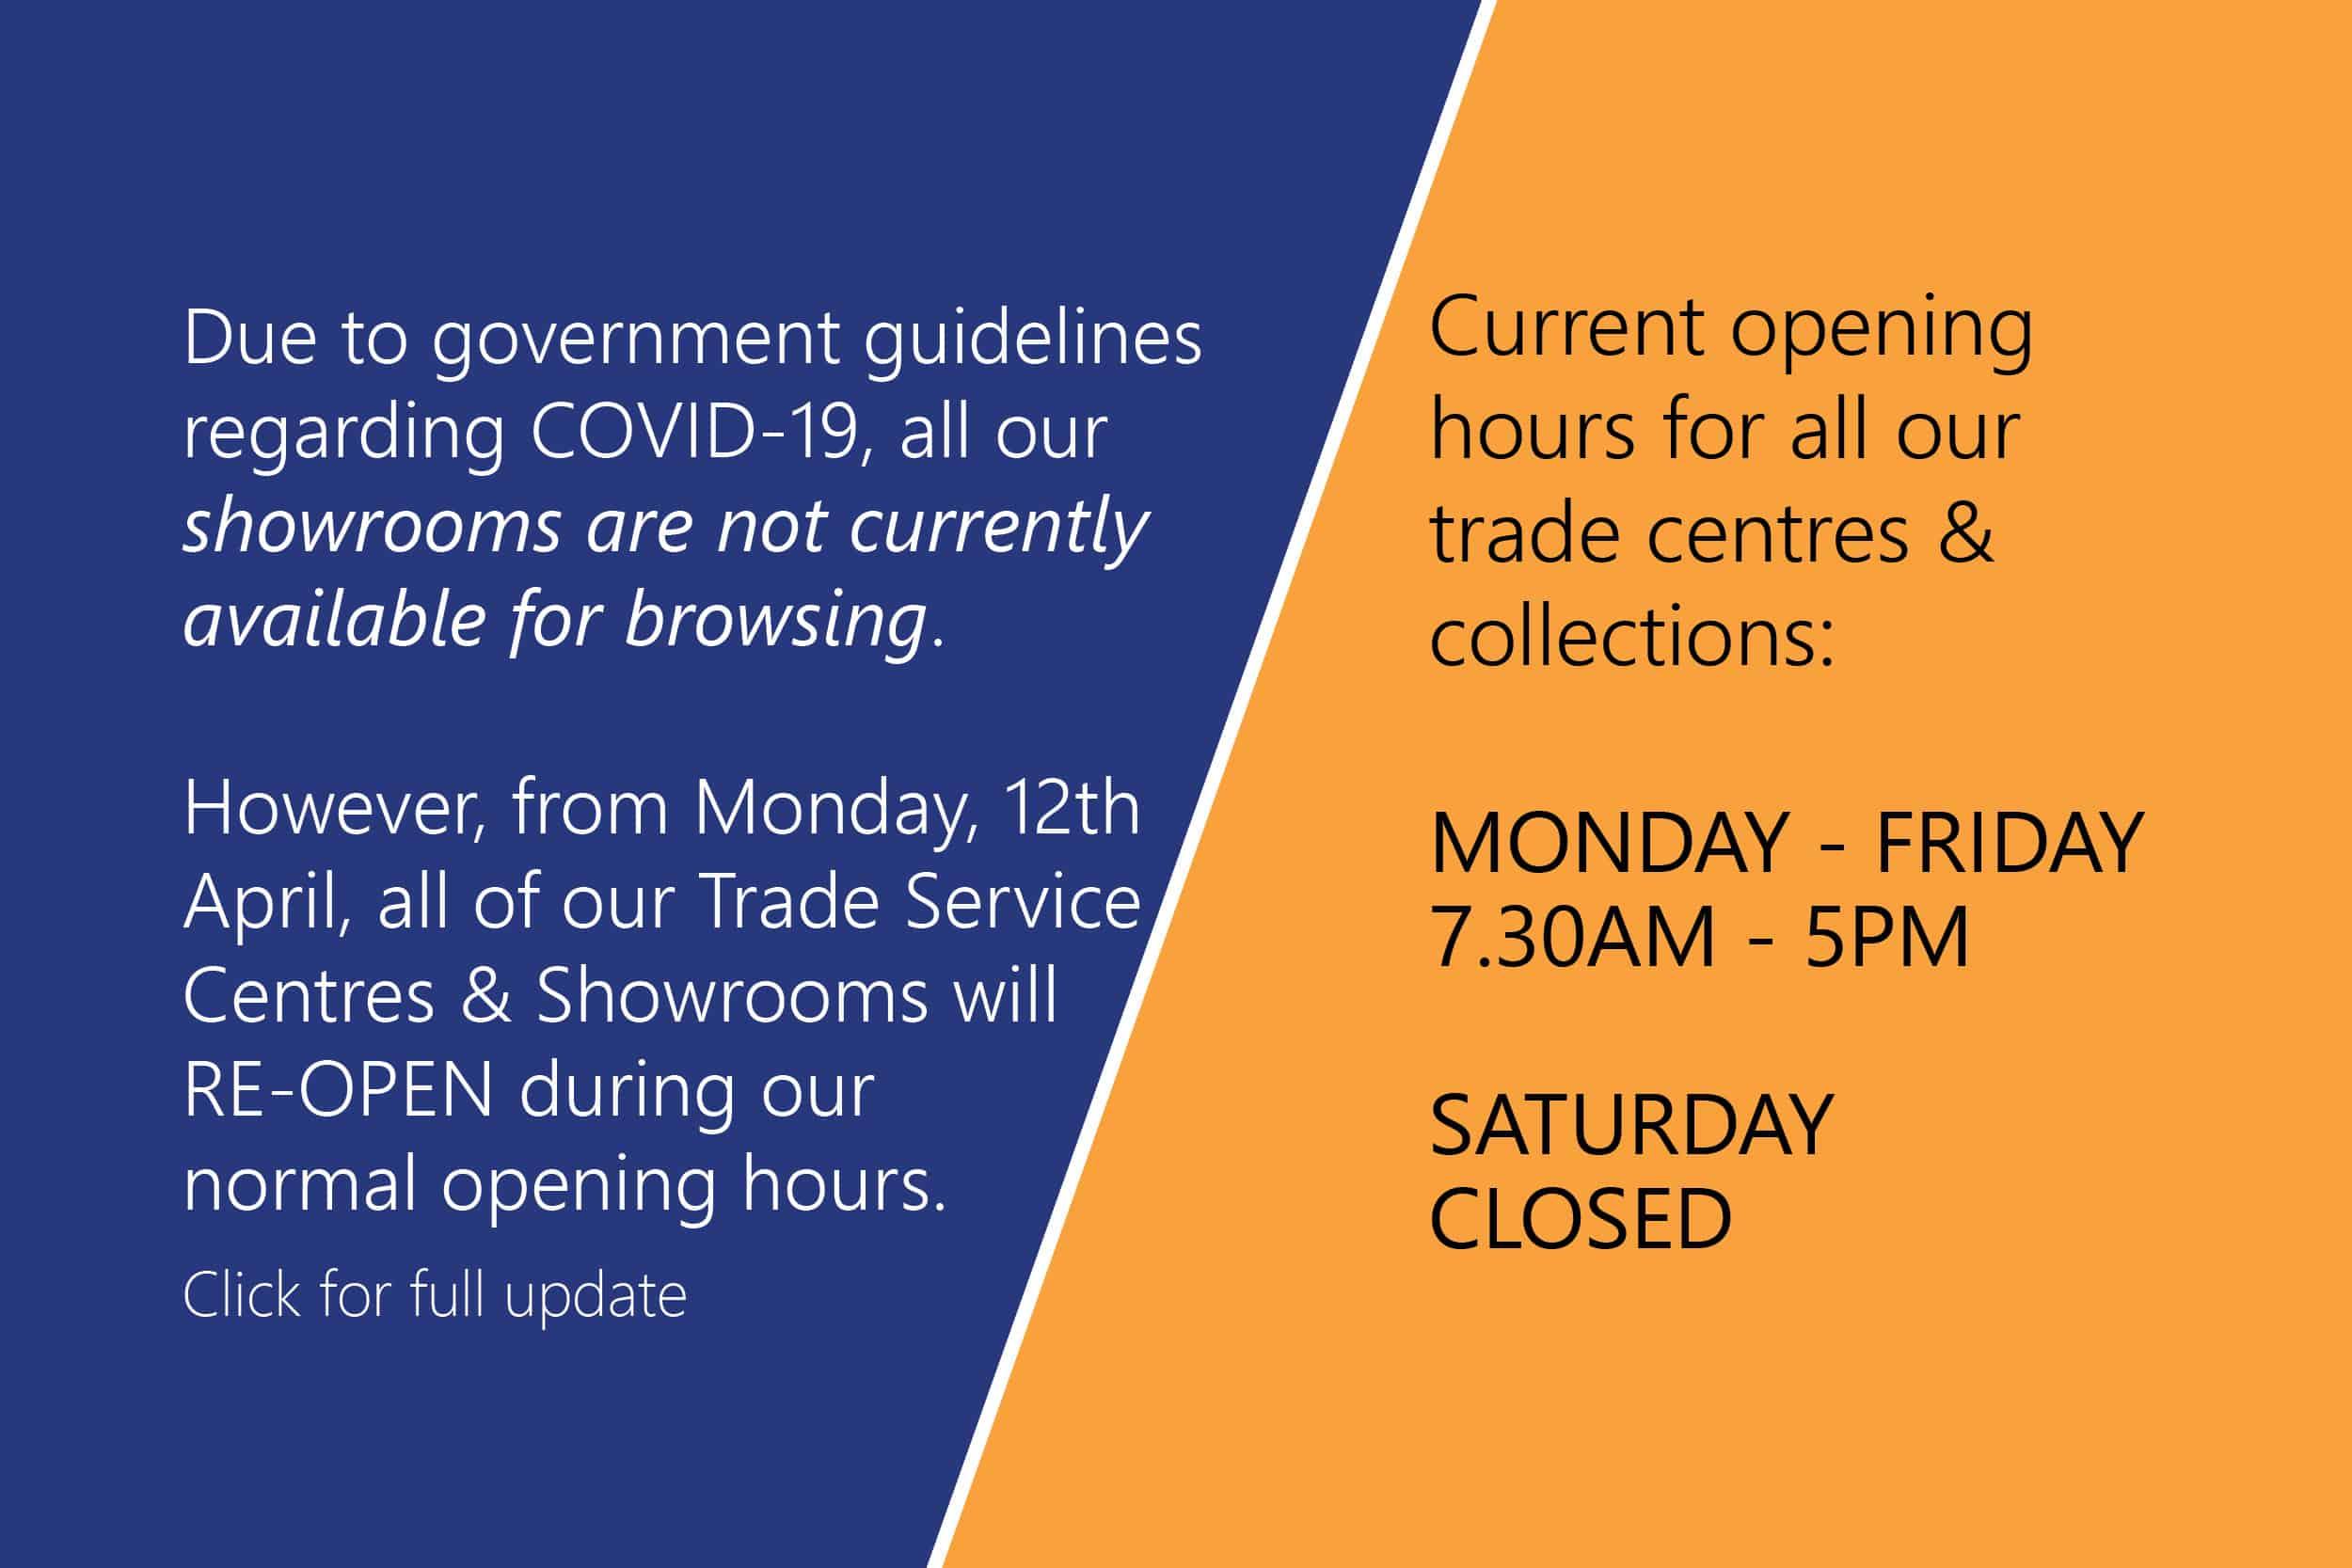 emc tiles reopen monday 12 april